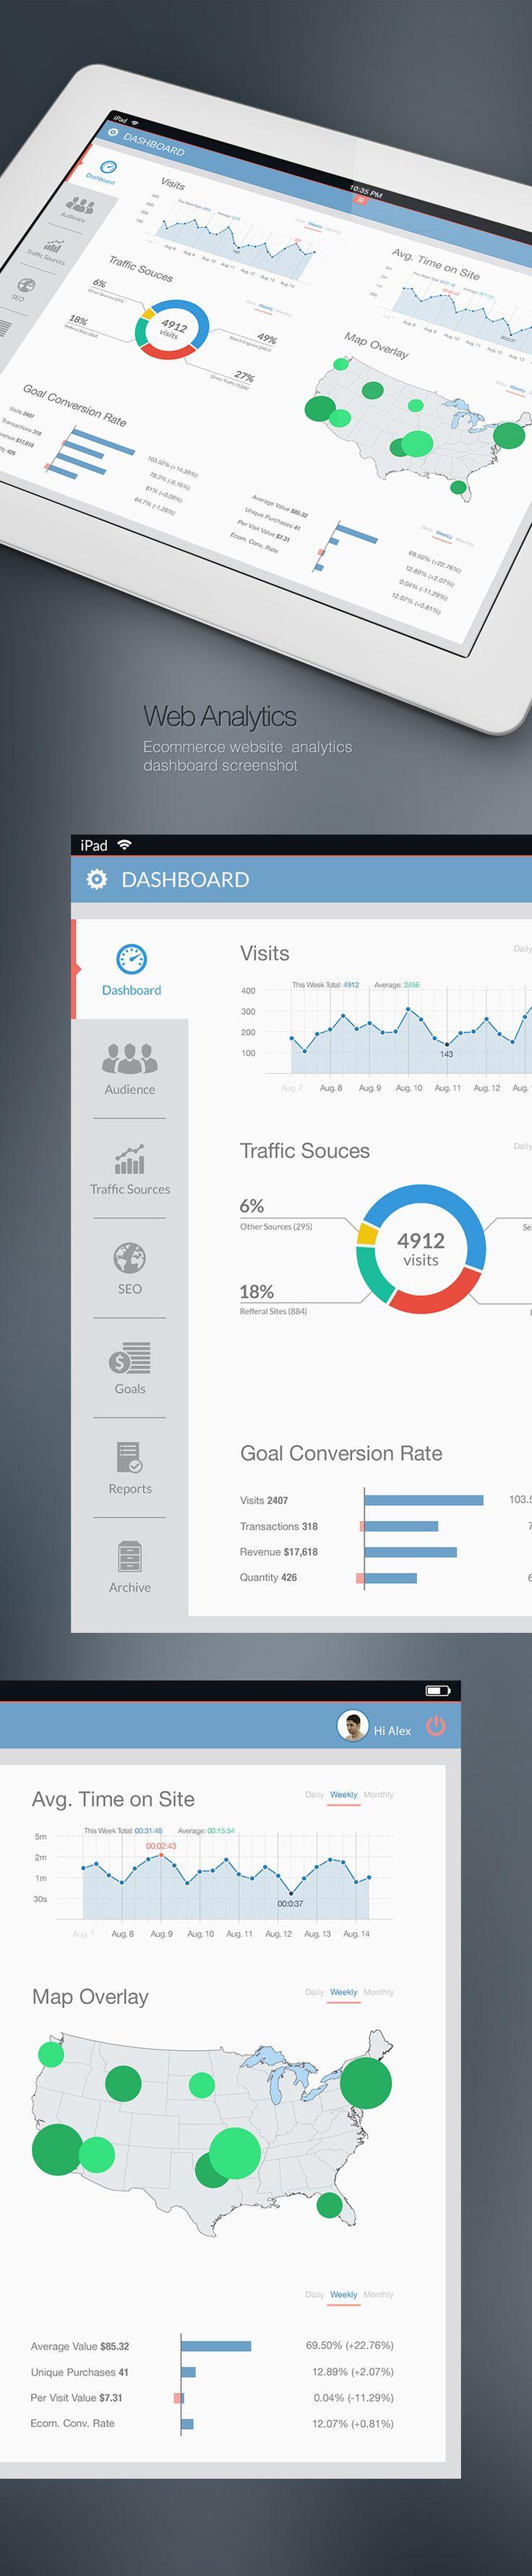 Ecommerce Website Analytics Dashboard Screenshot